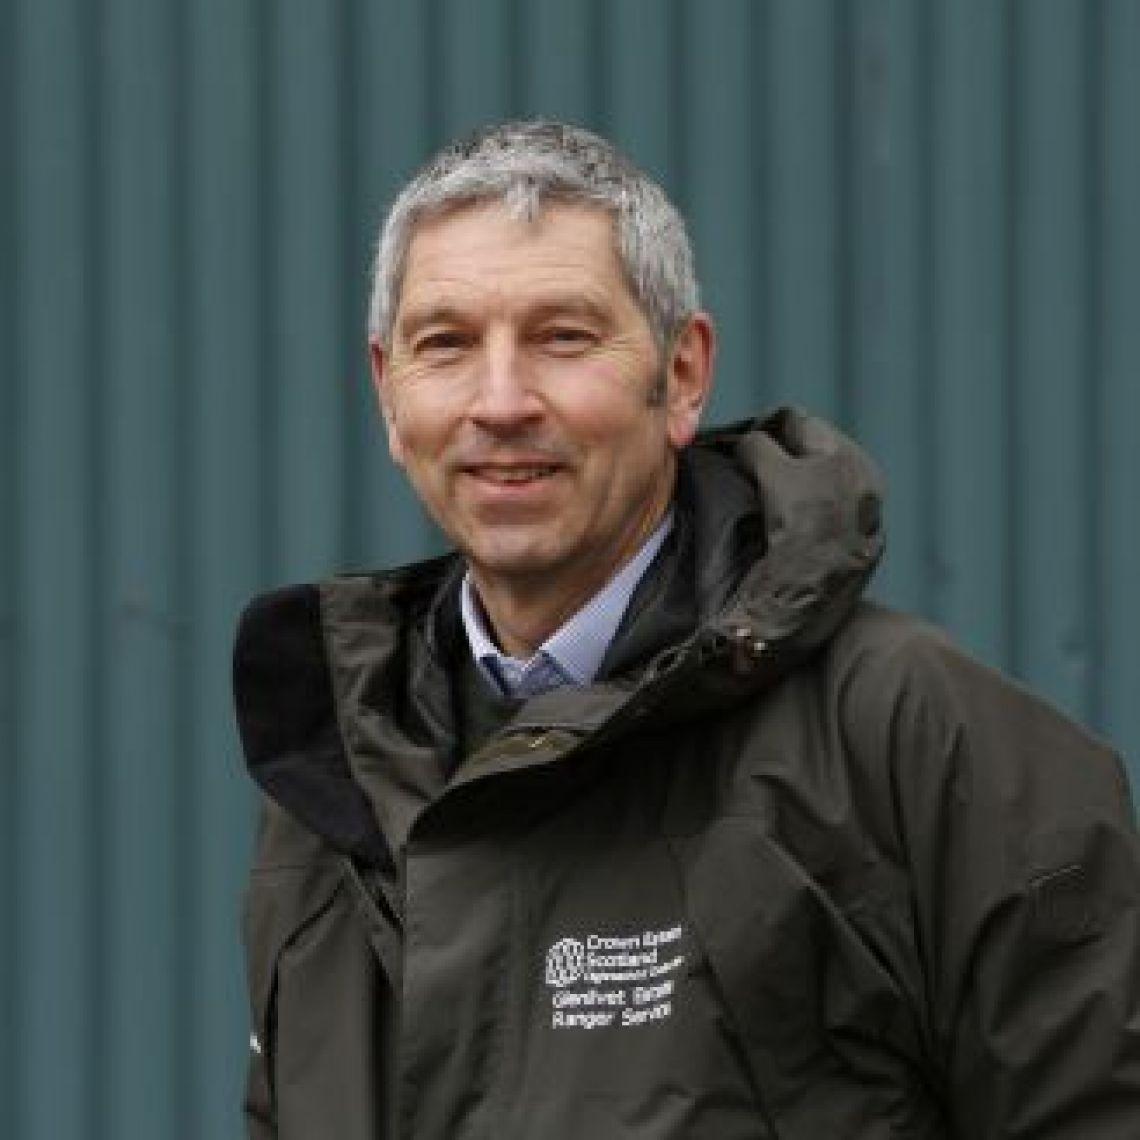 Simon Hodge